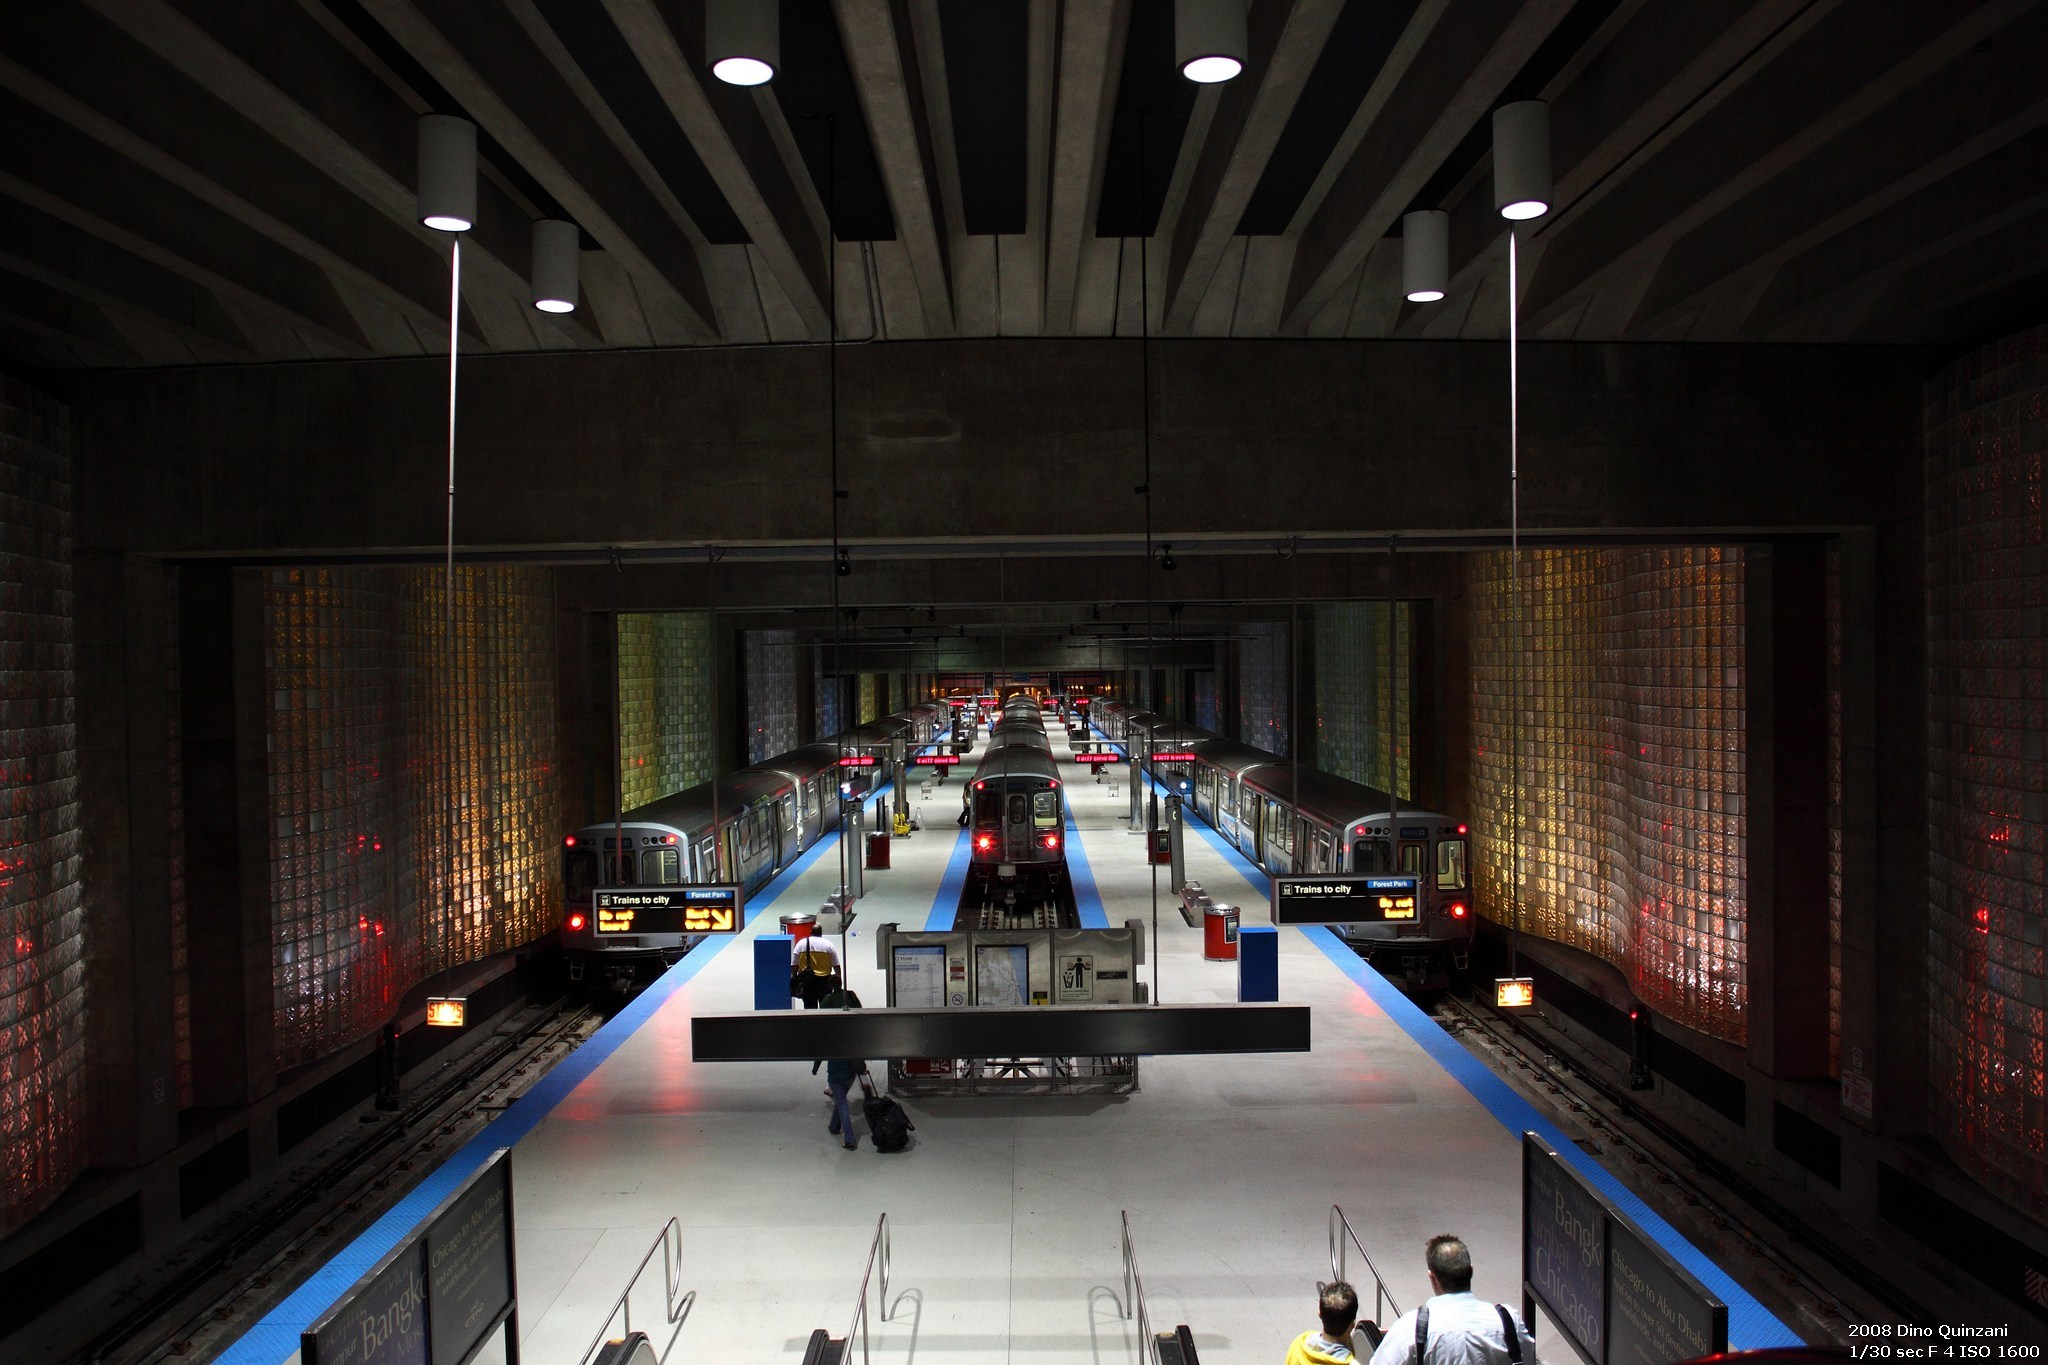 O'Hare CTA station